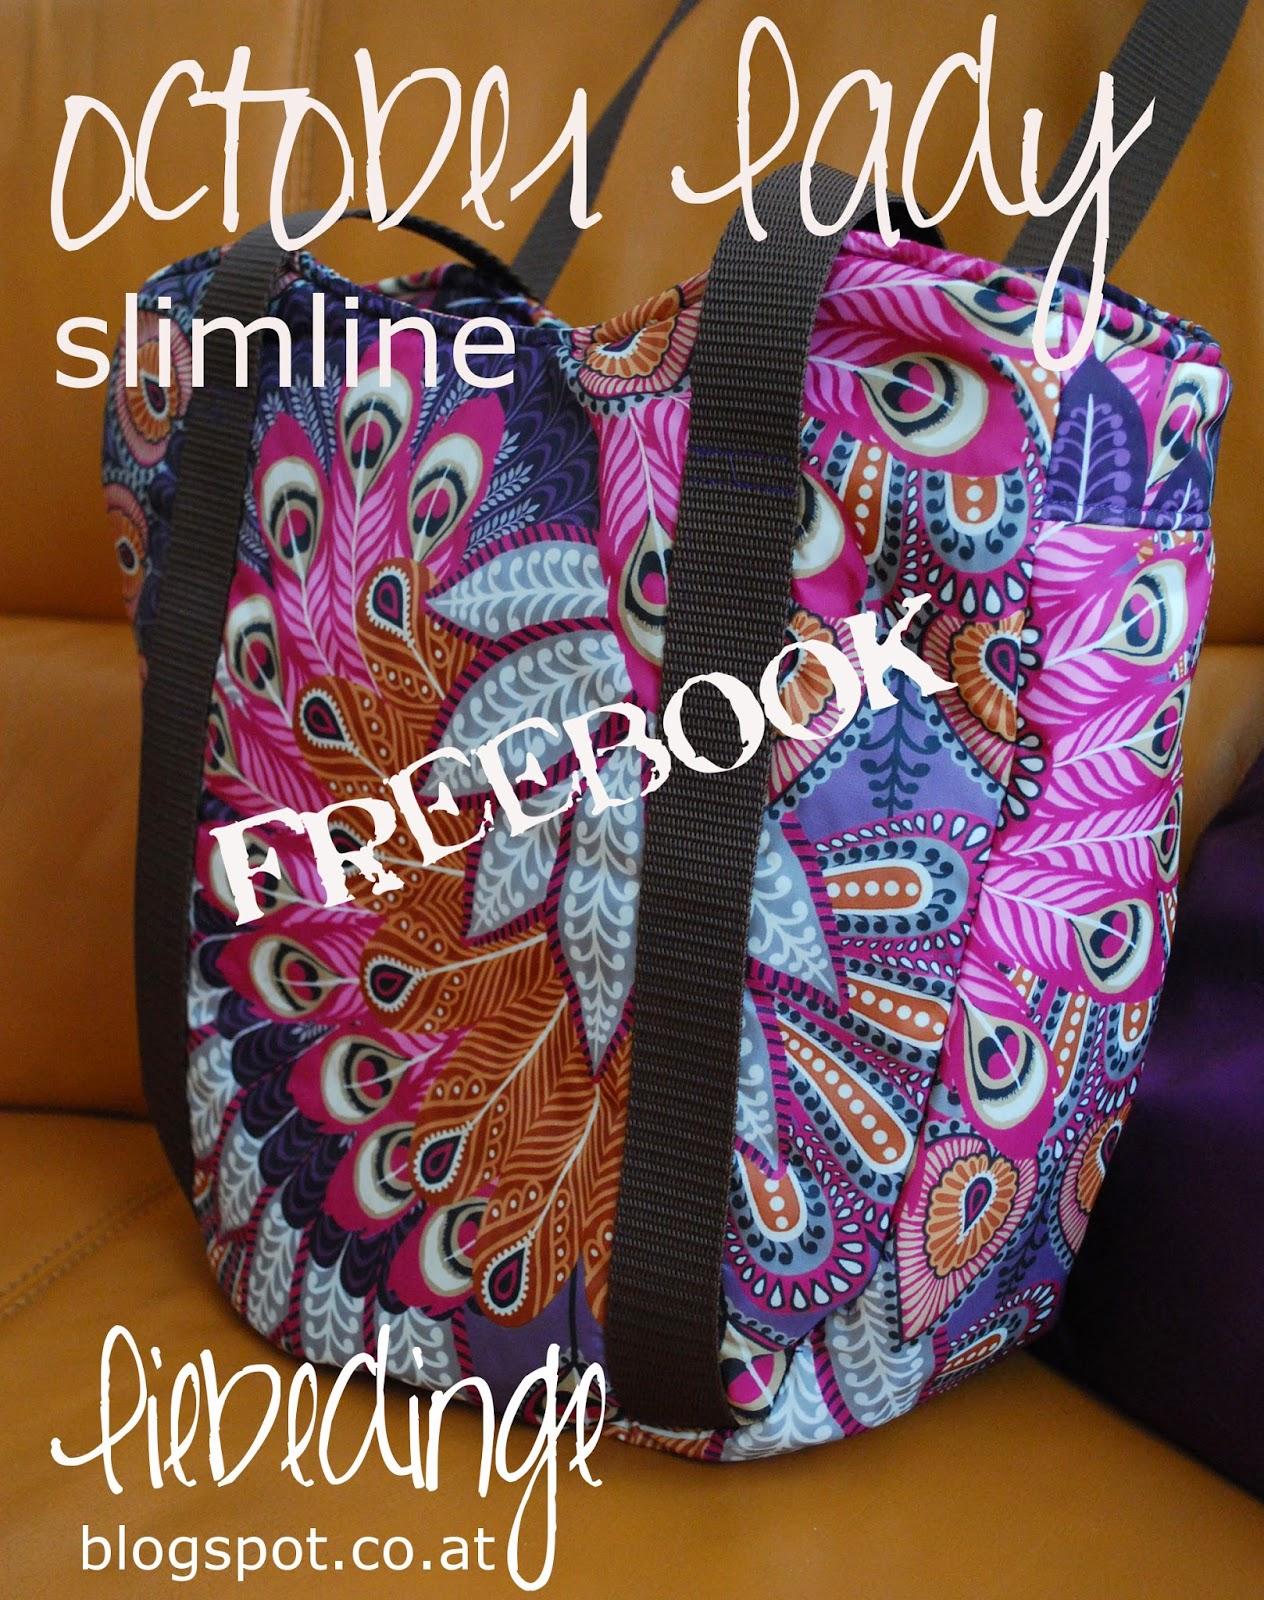 october lady - slimline!! [freebook]